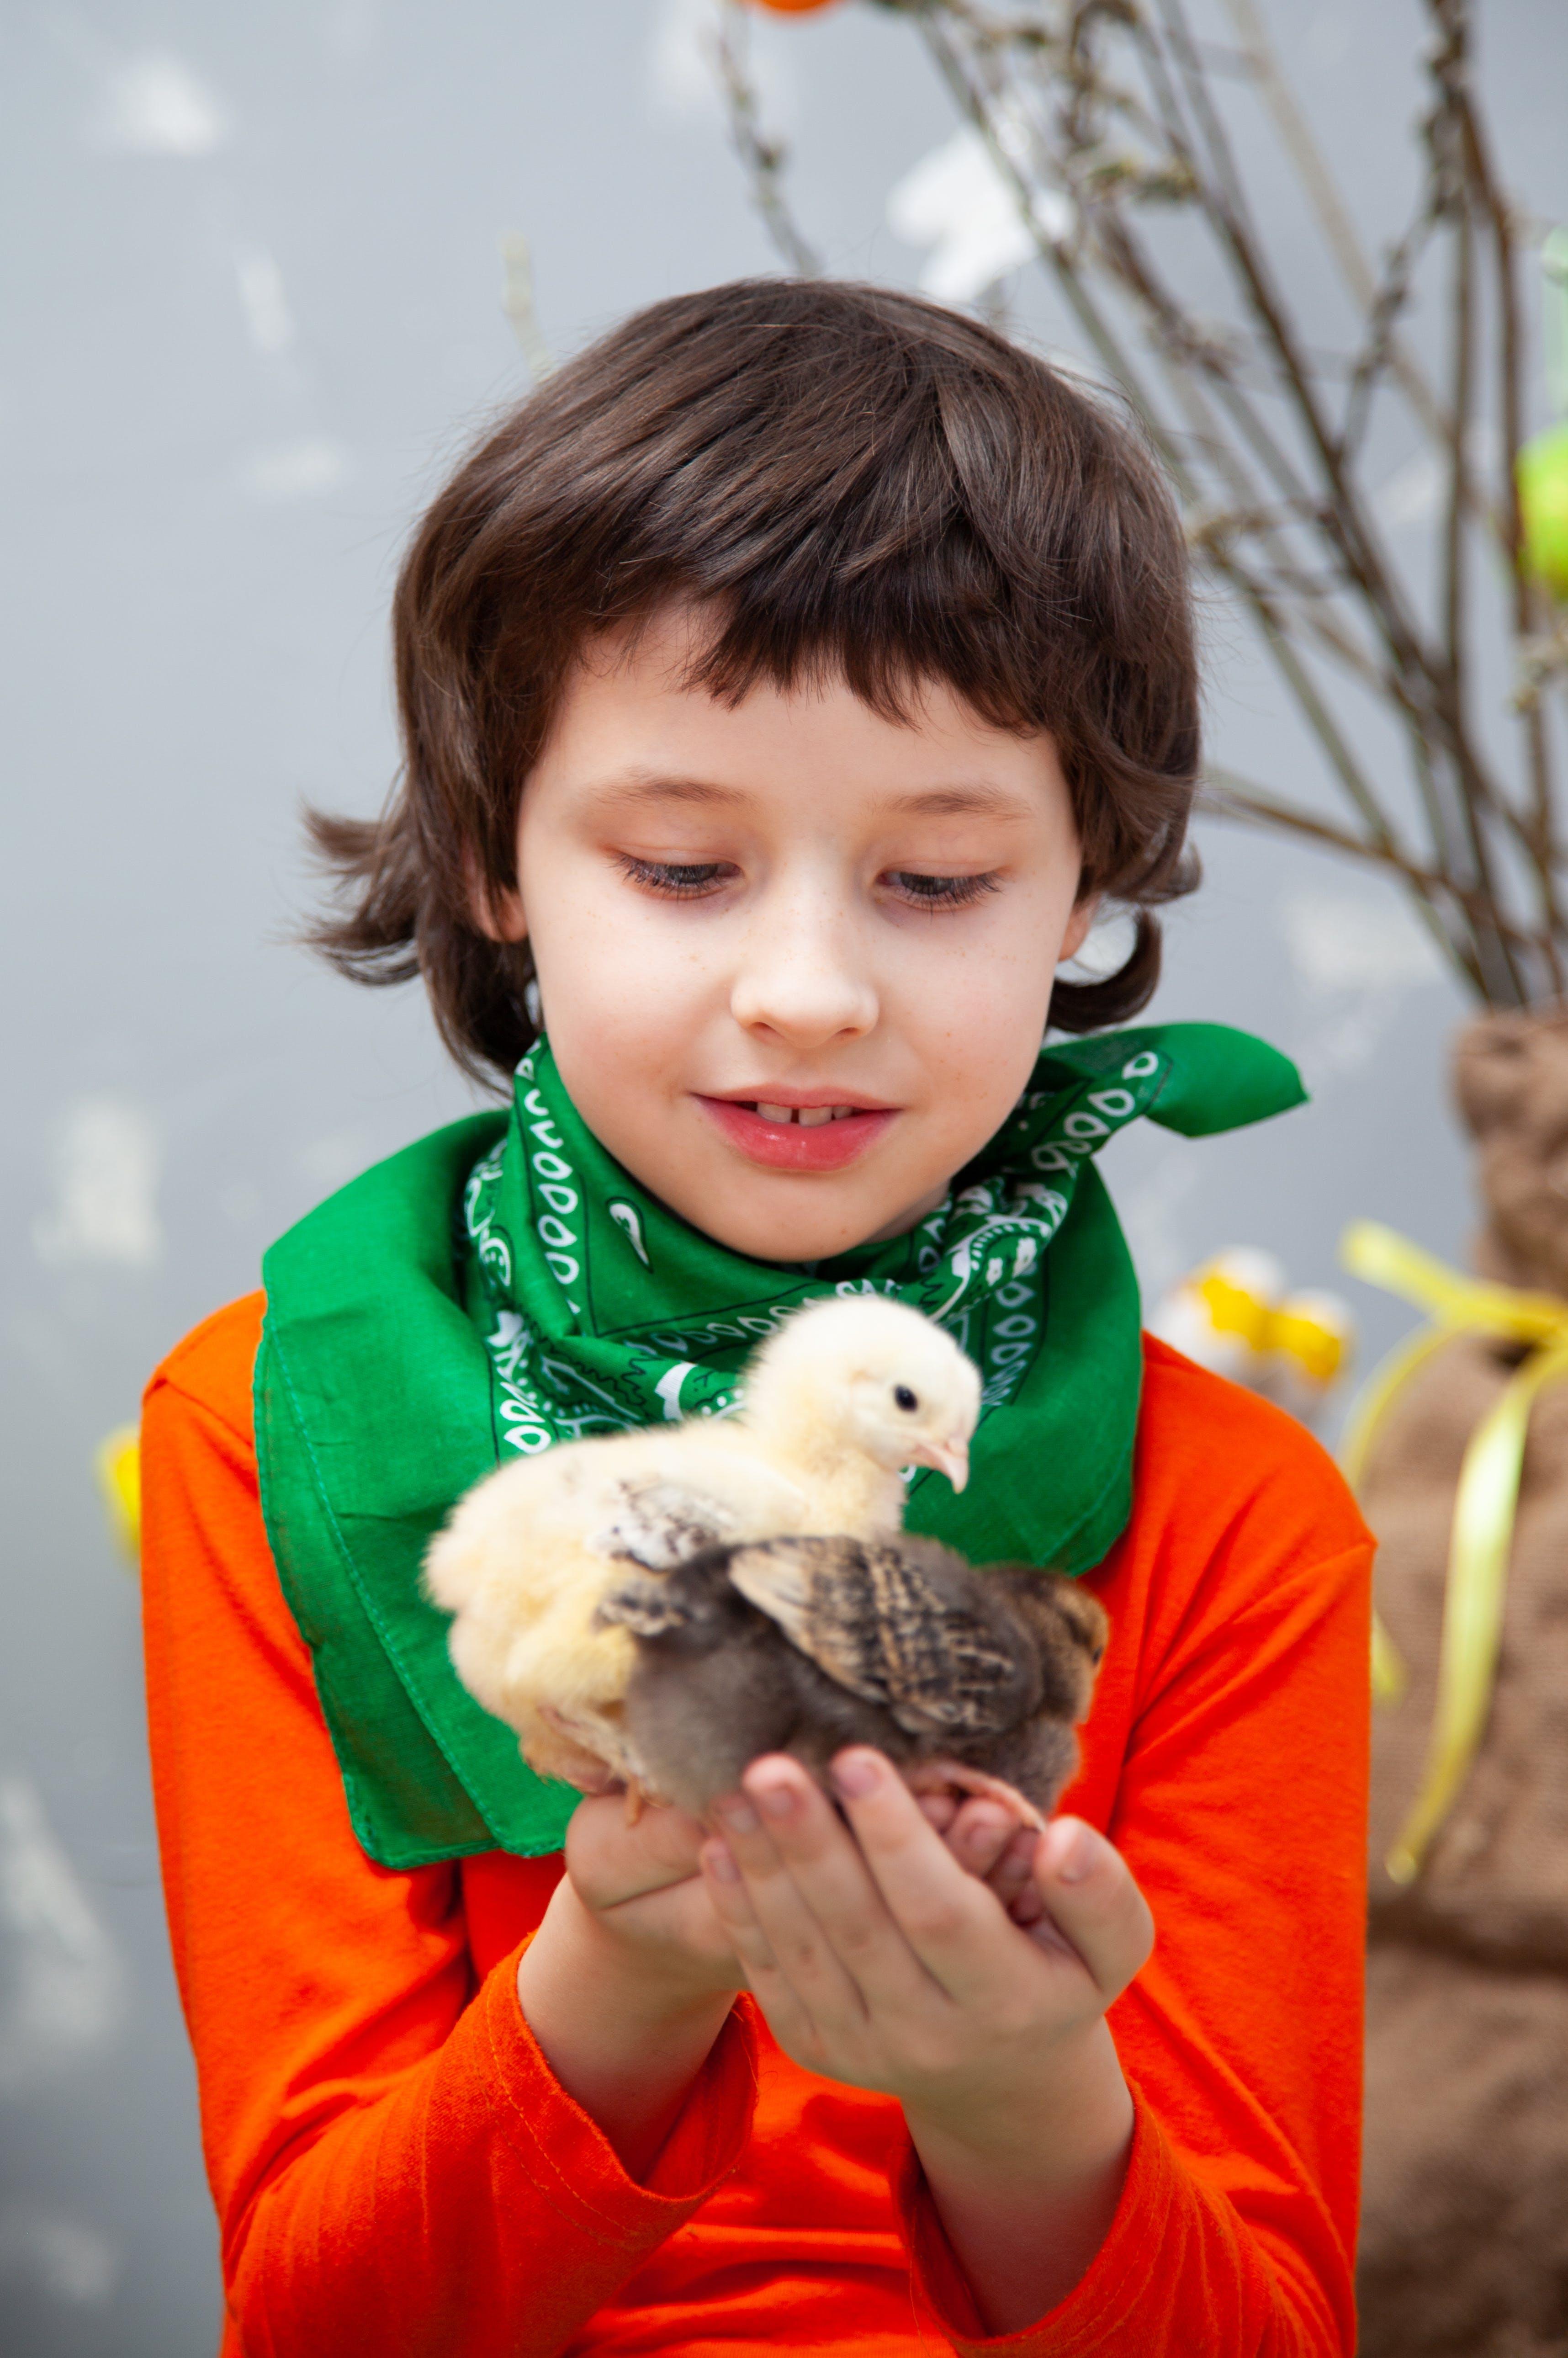 Boy Holding Birds